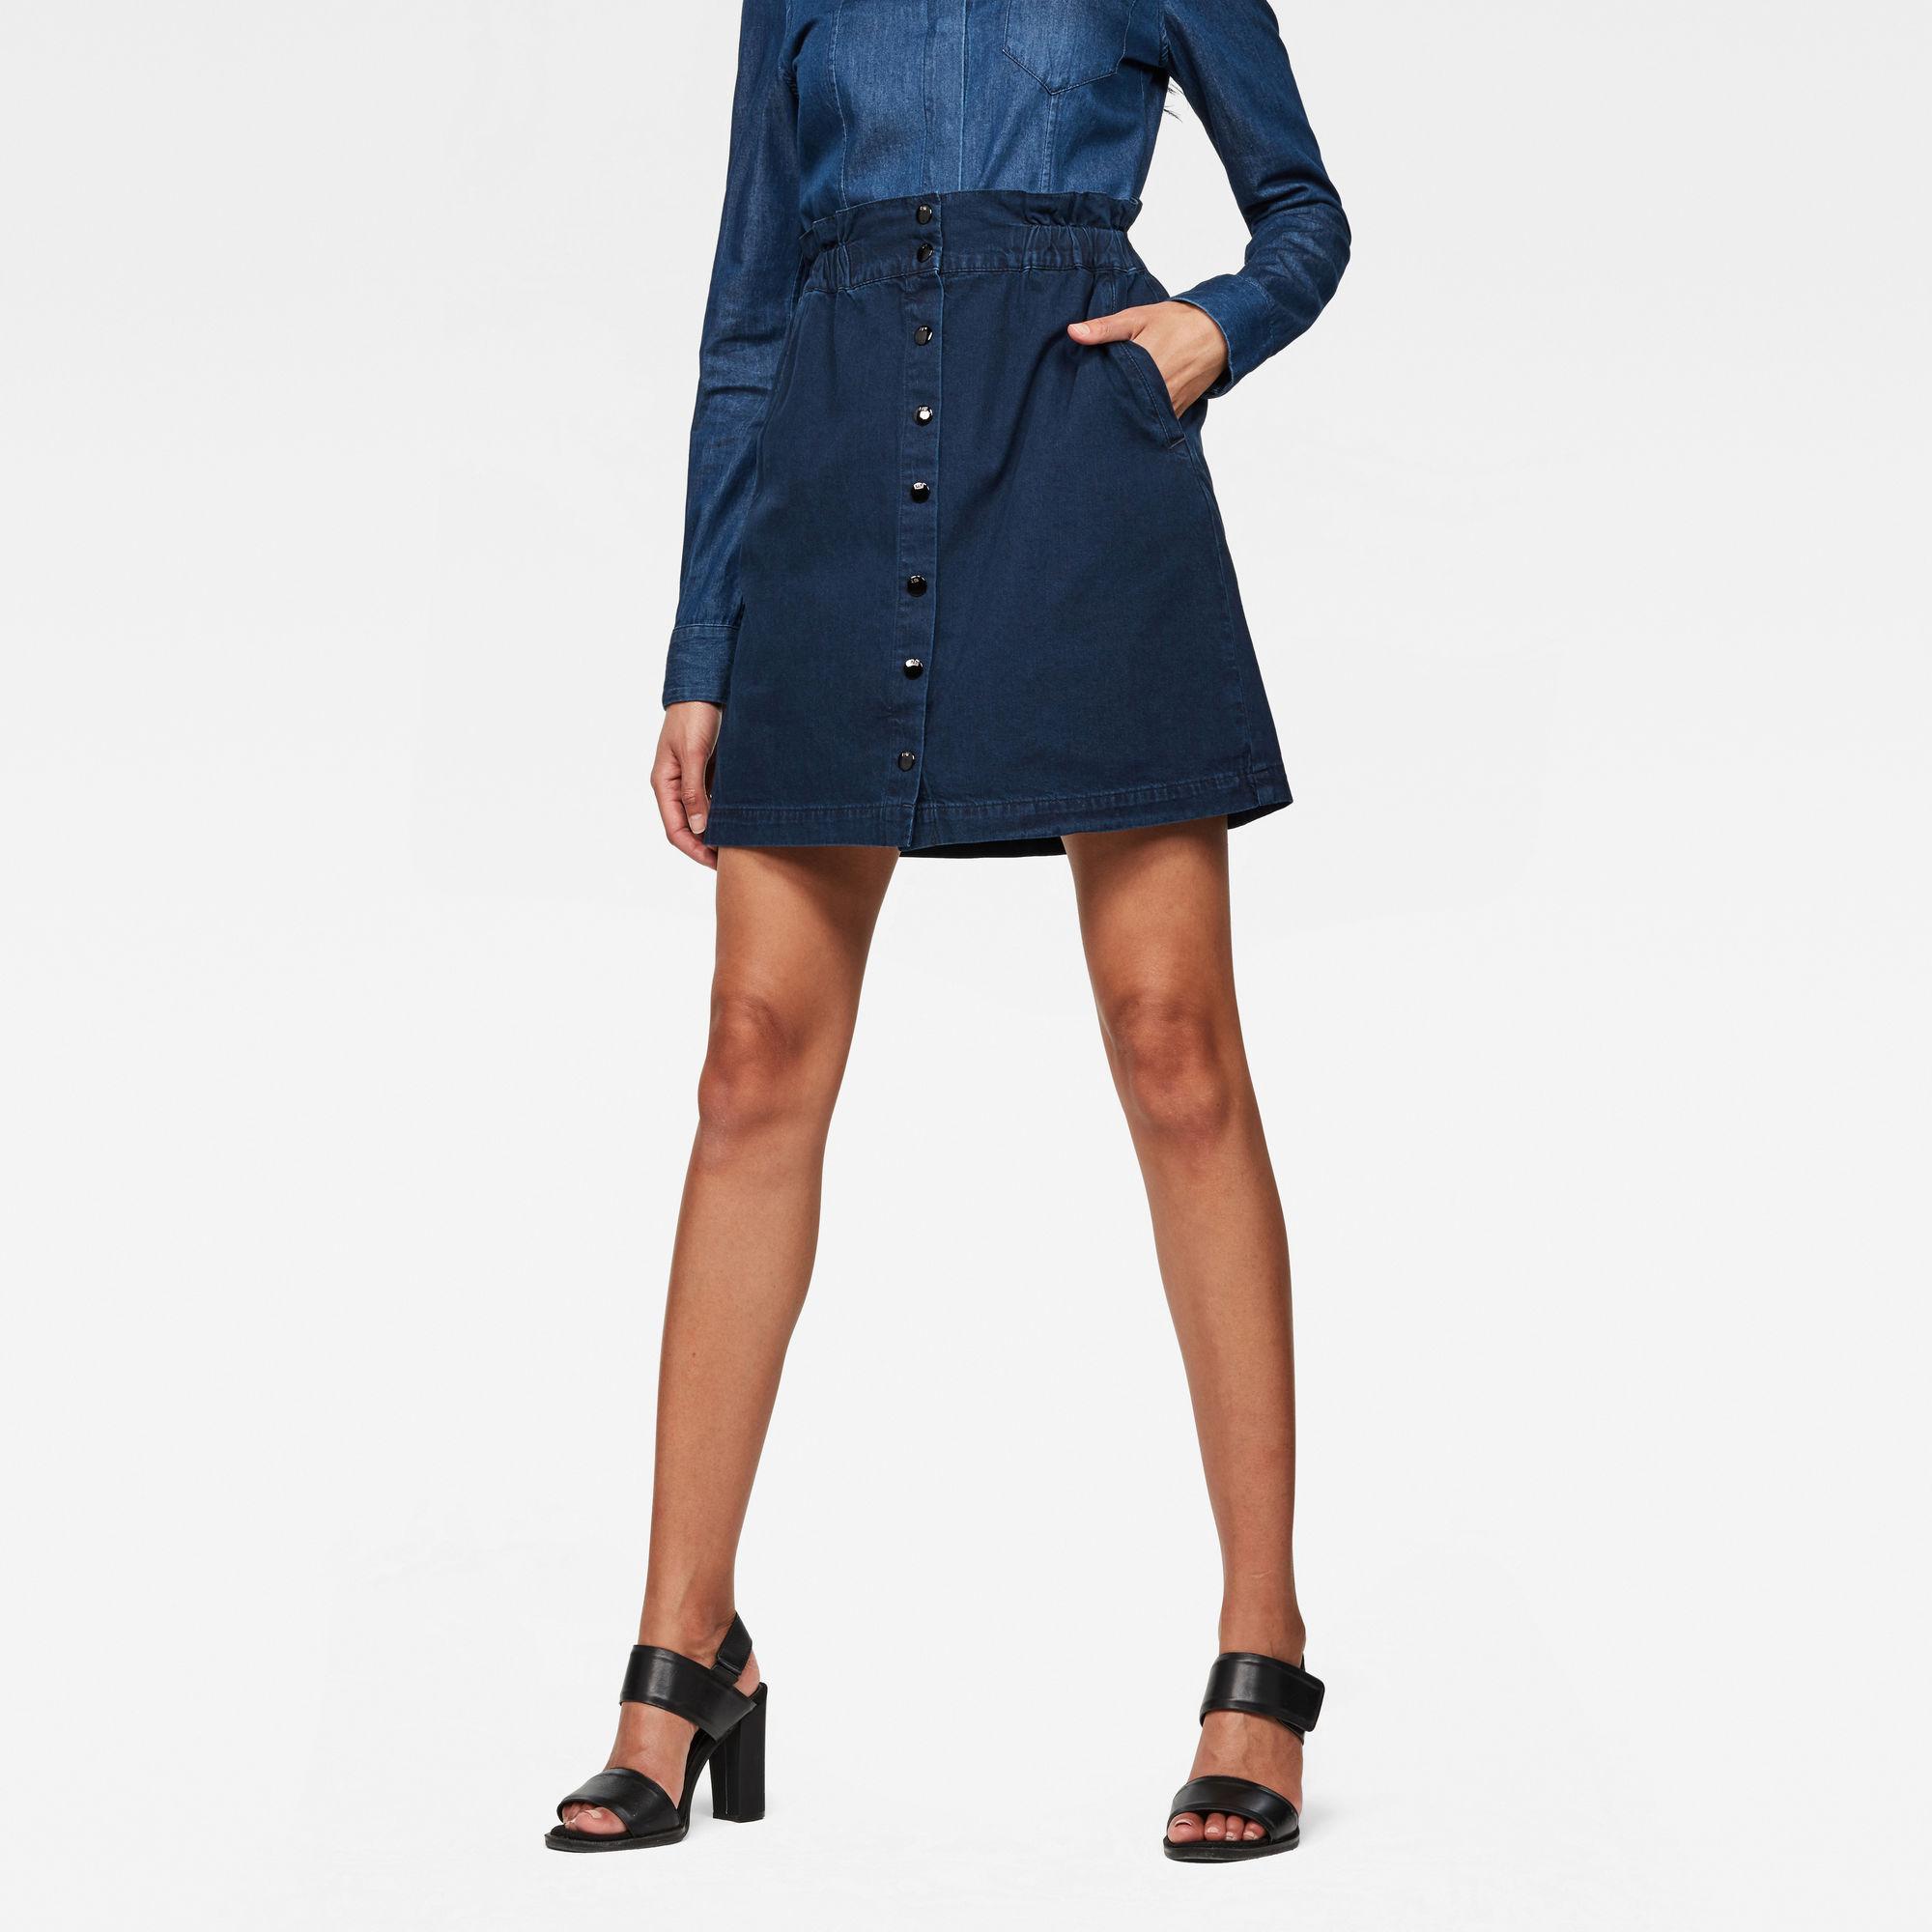 Image of G Star Raw Bronson Paperbag Mini Skirt